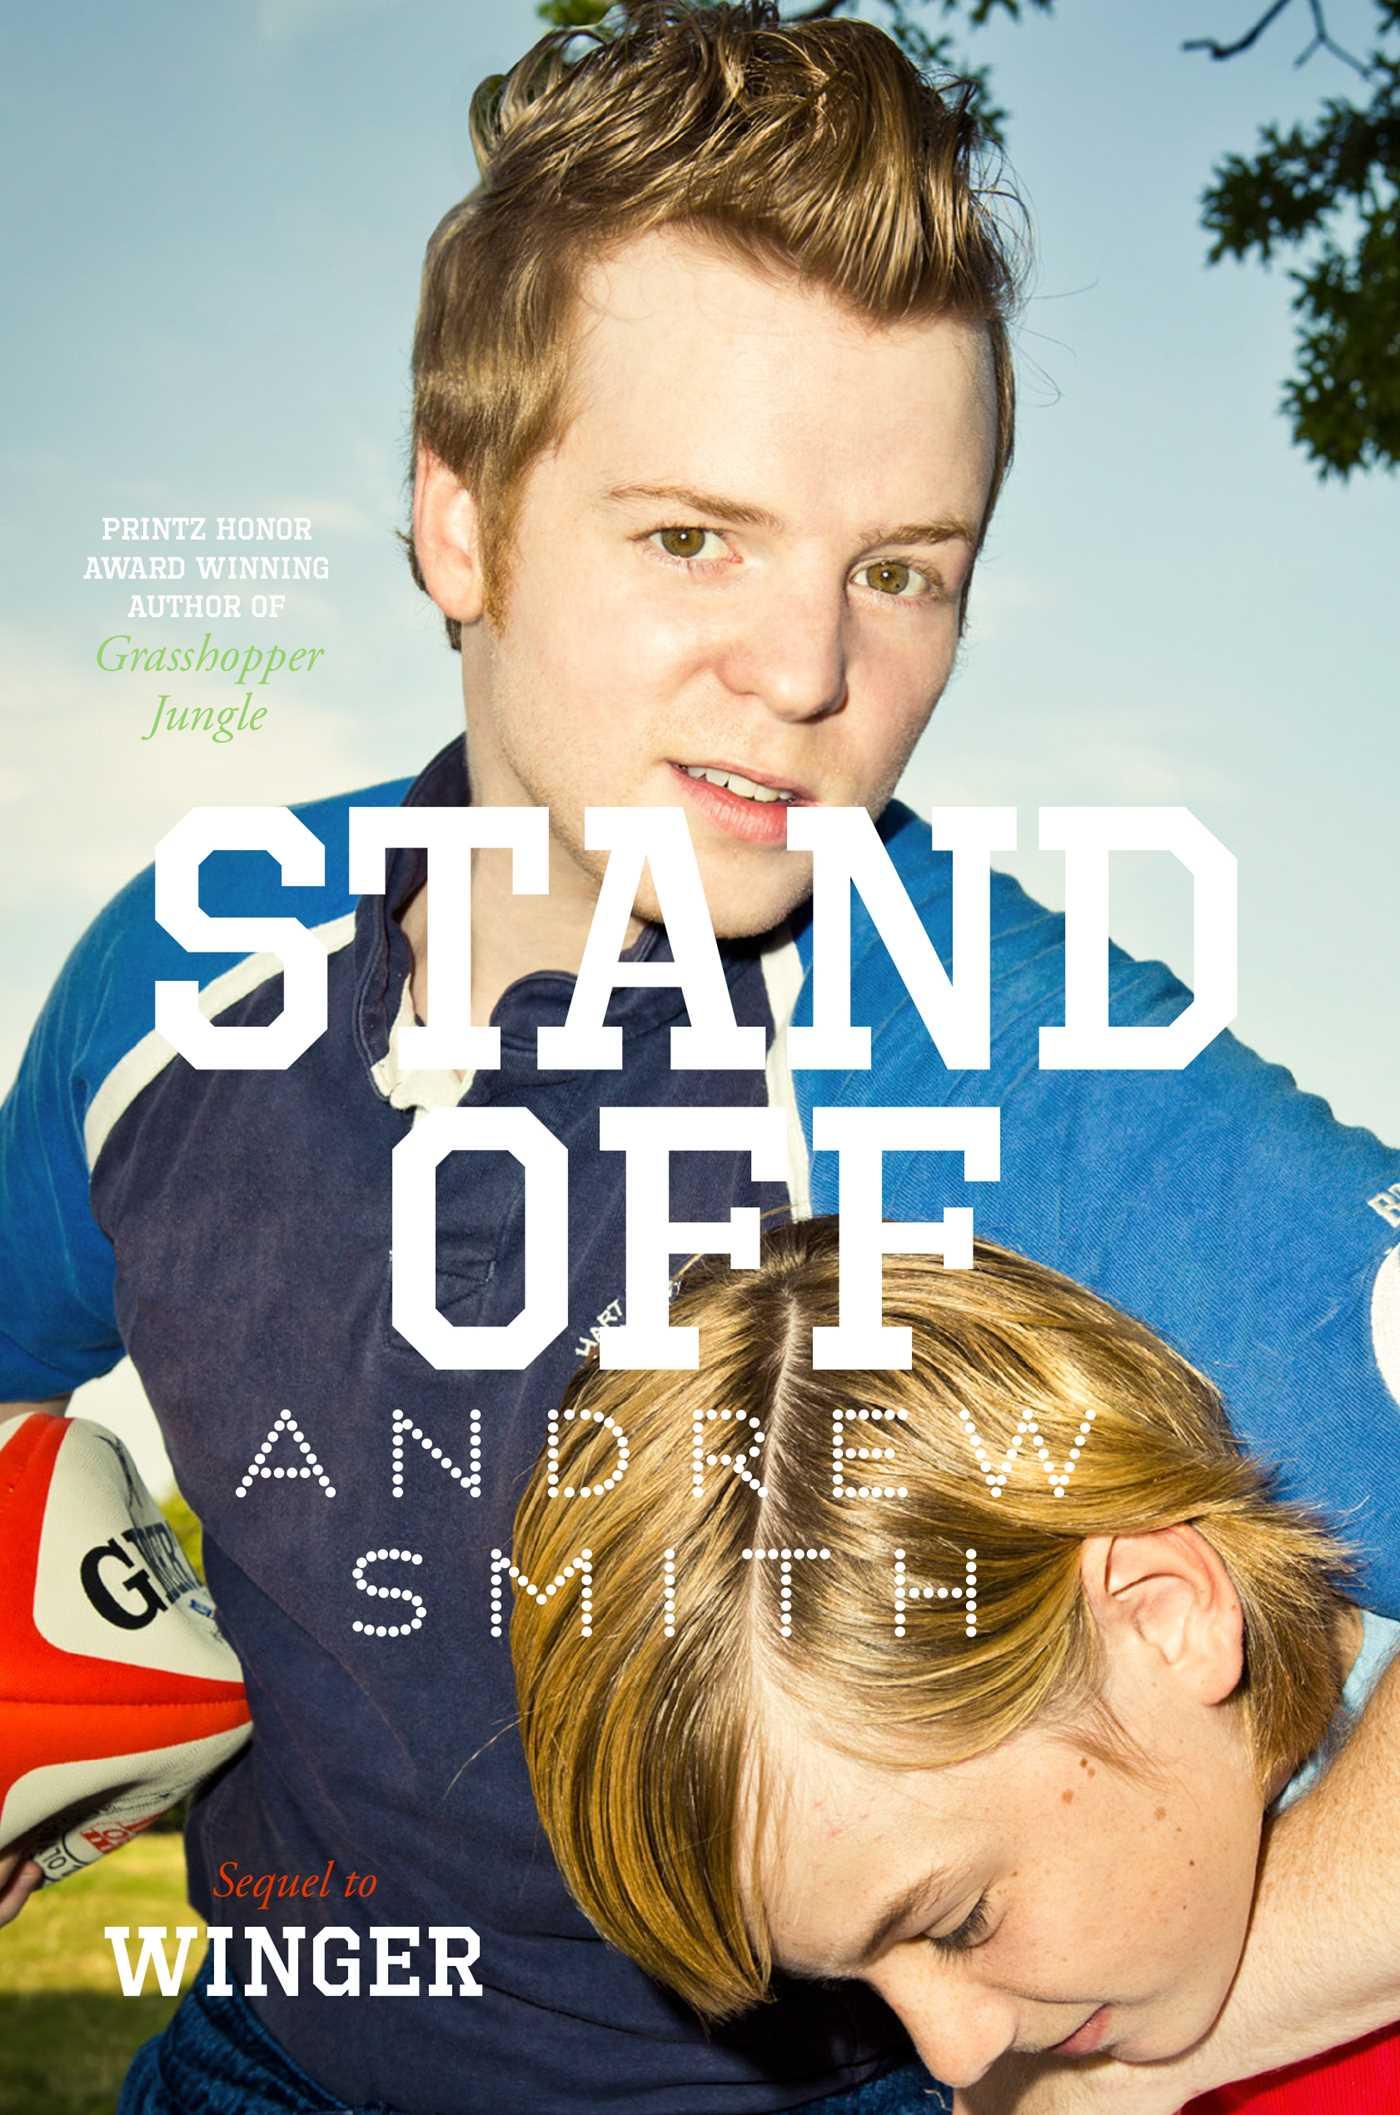 Author Andrew Smith's Top Ten Albums Of 2015